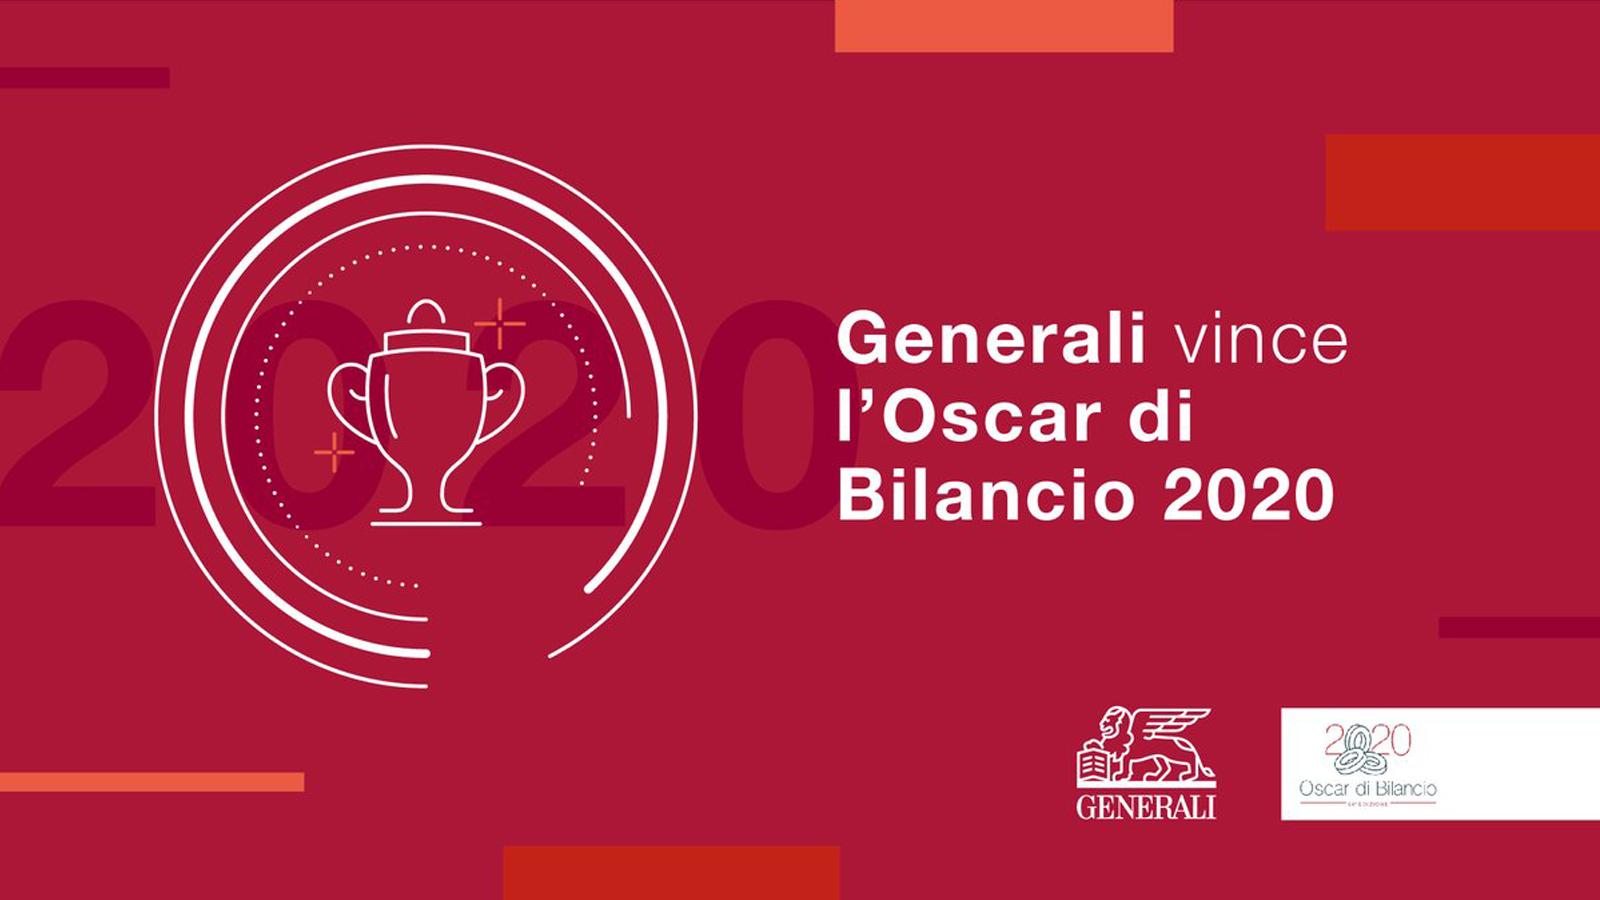 Generali Oscar di Bilancio